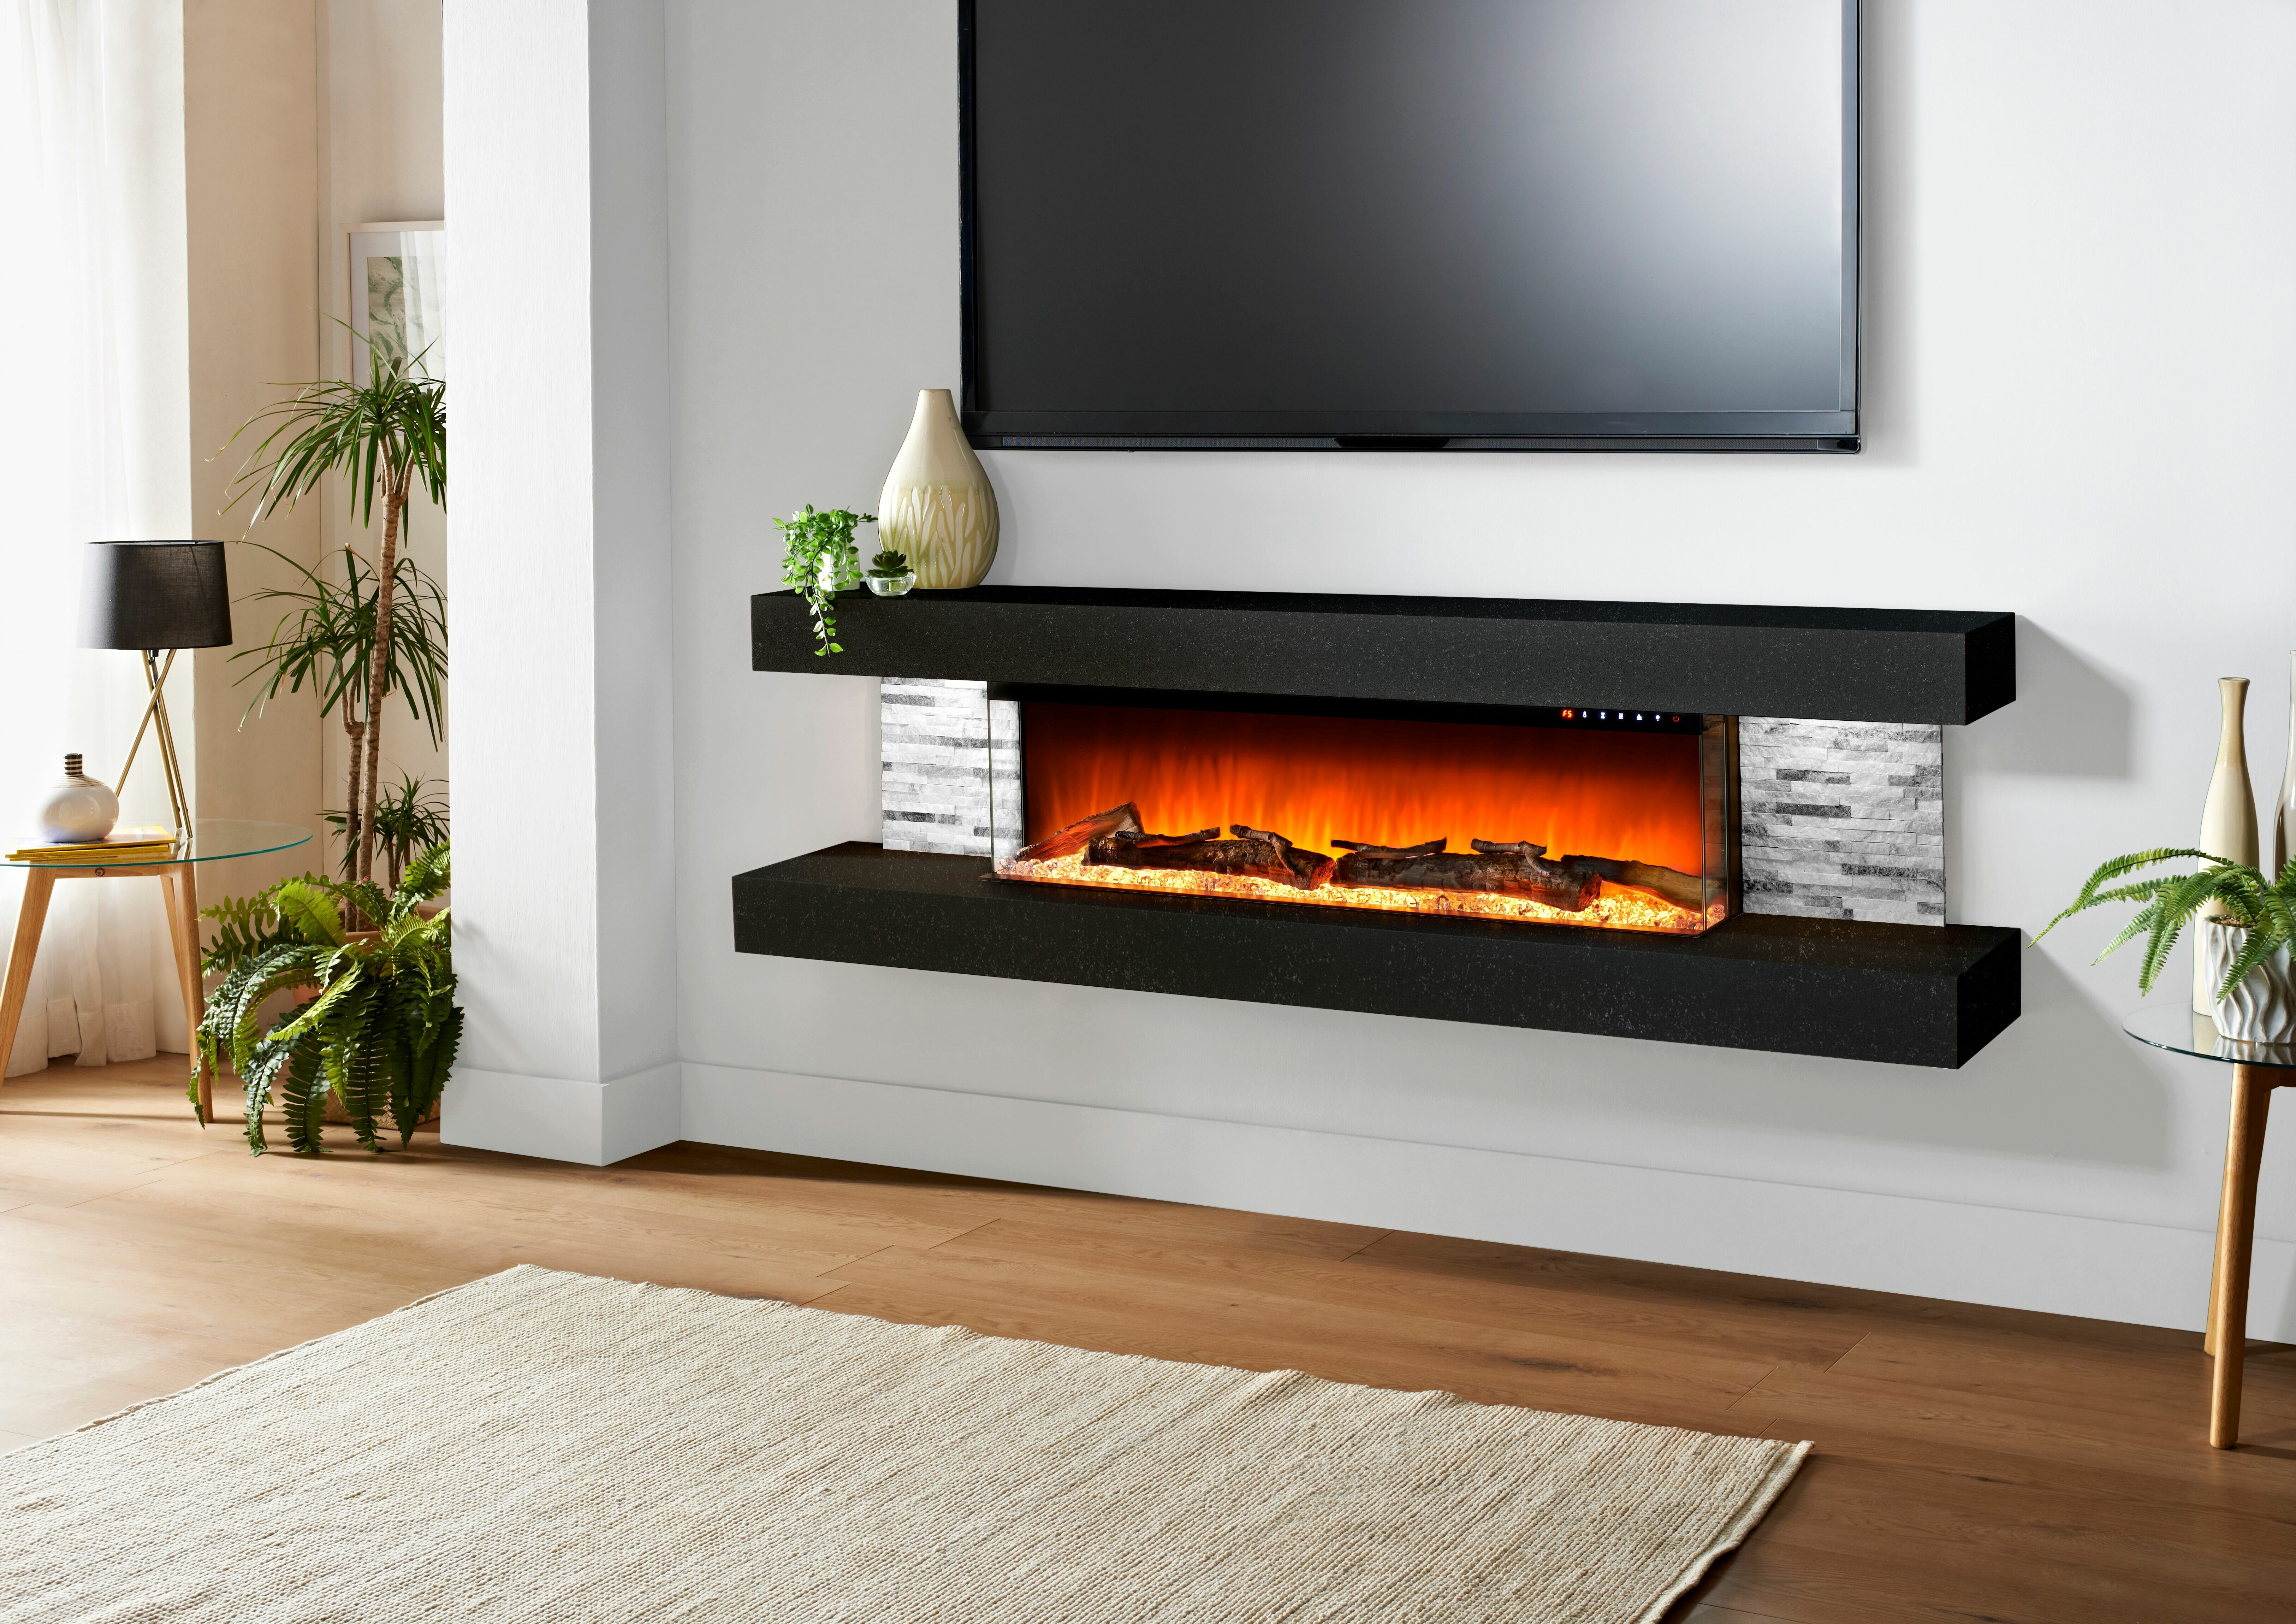 Stupendous Vegas Wall Mounted Electric Fireplace Download Free Architecture Designs Rallybritishbridgeorg